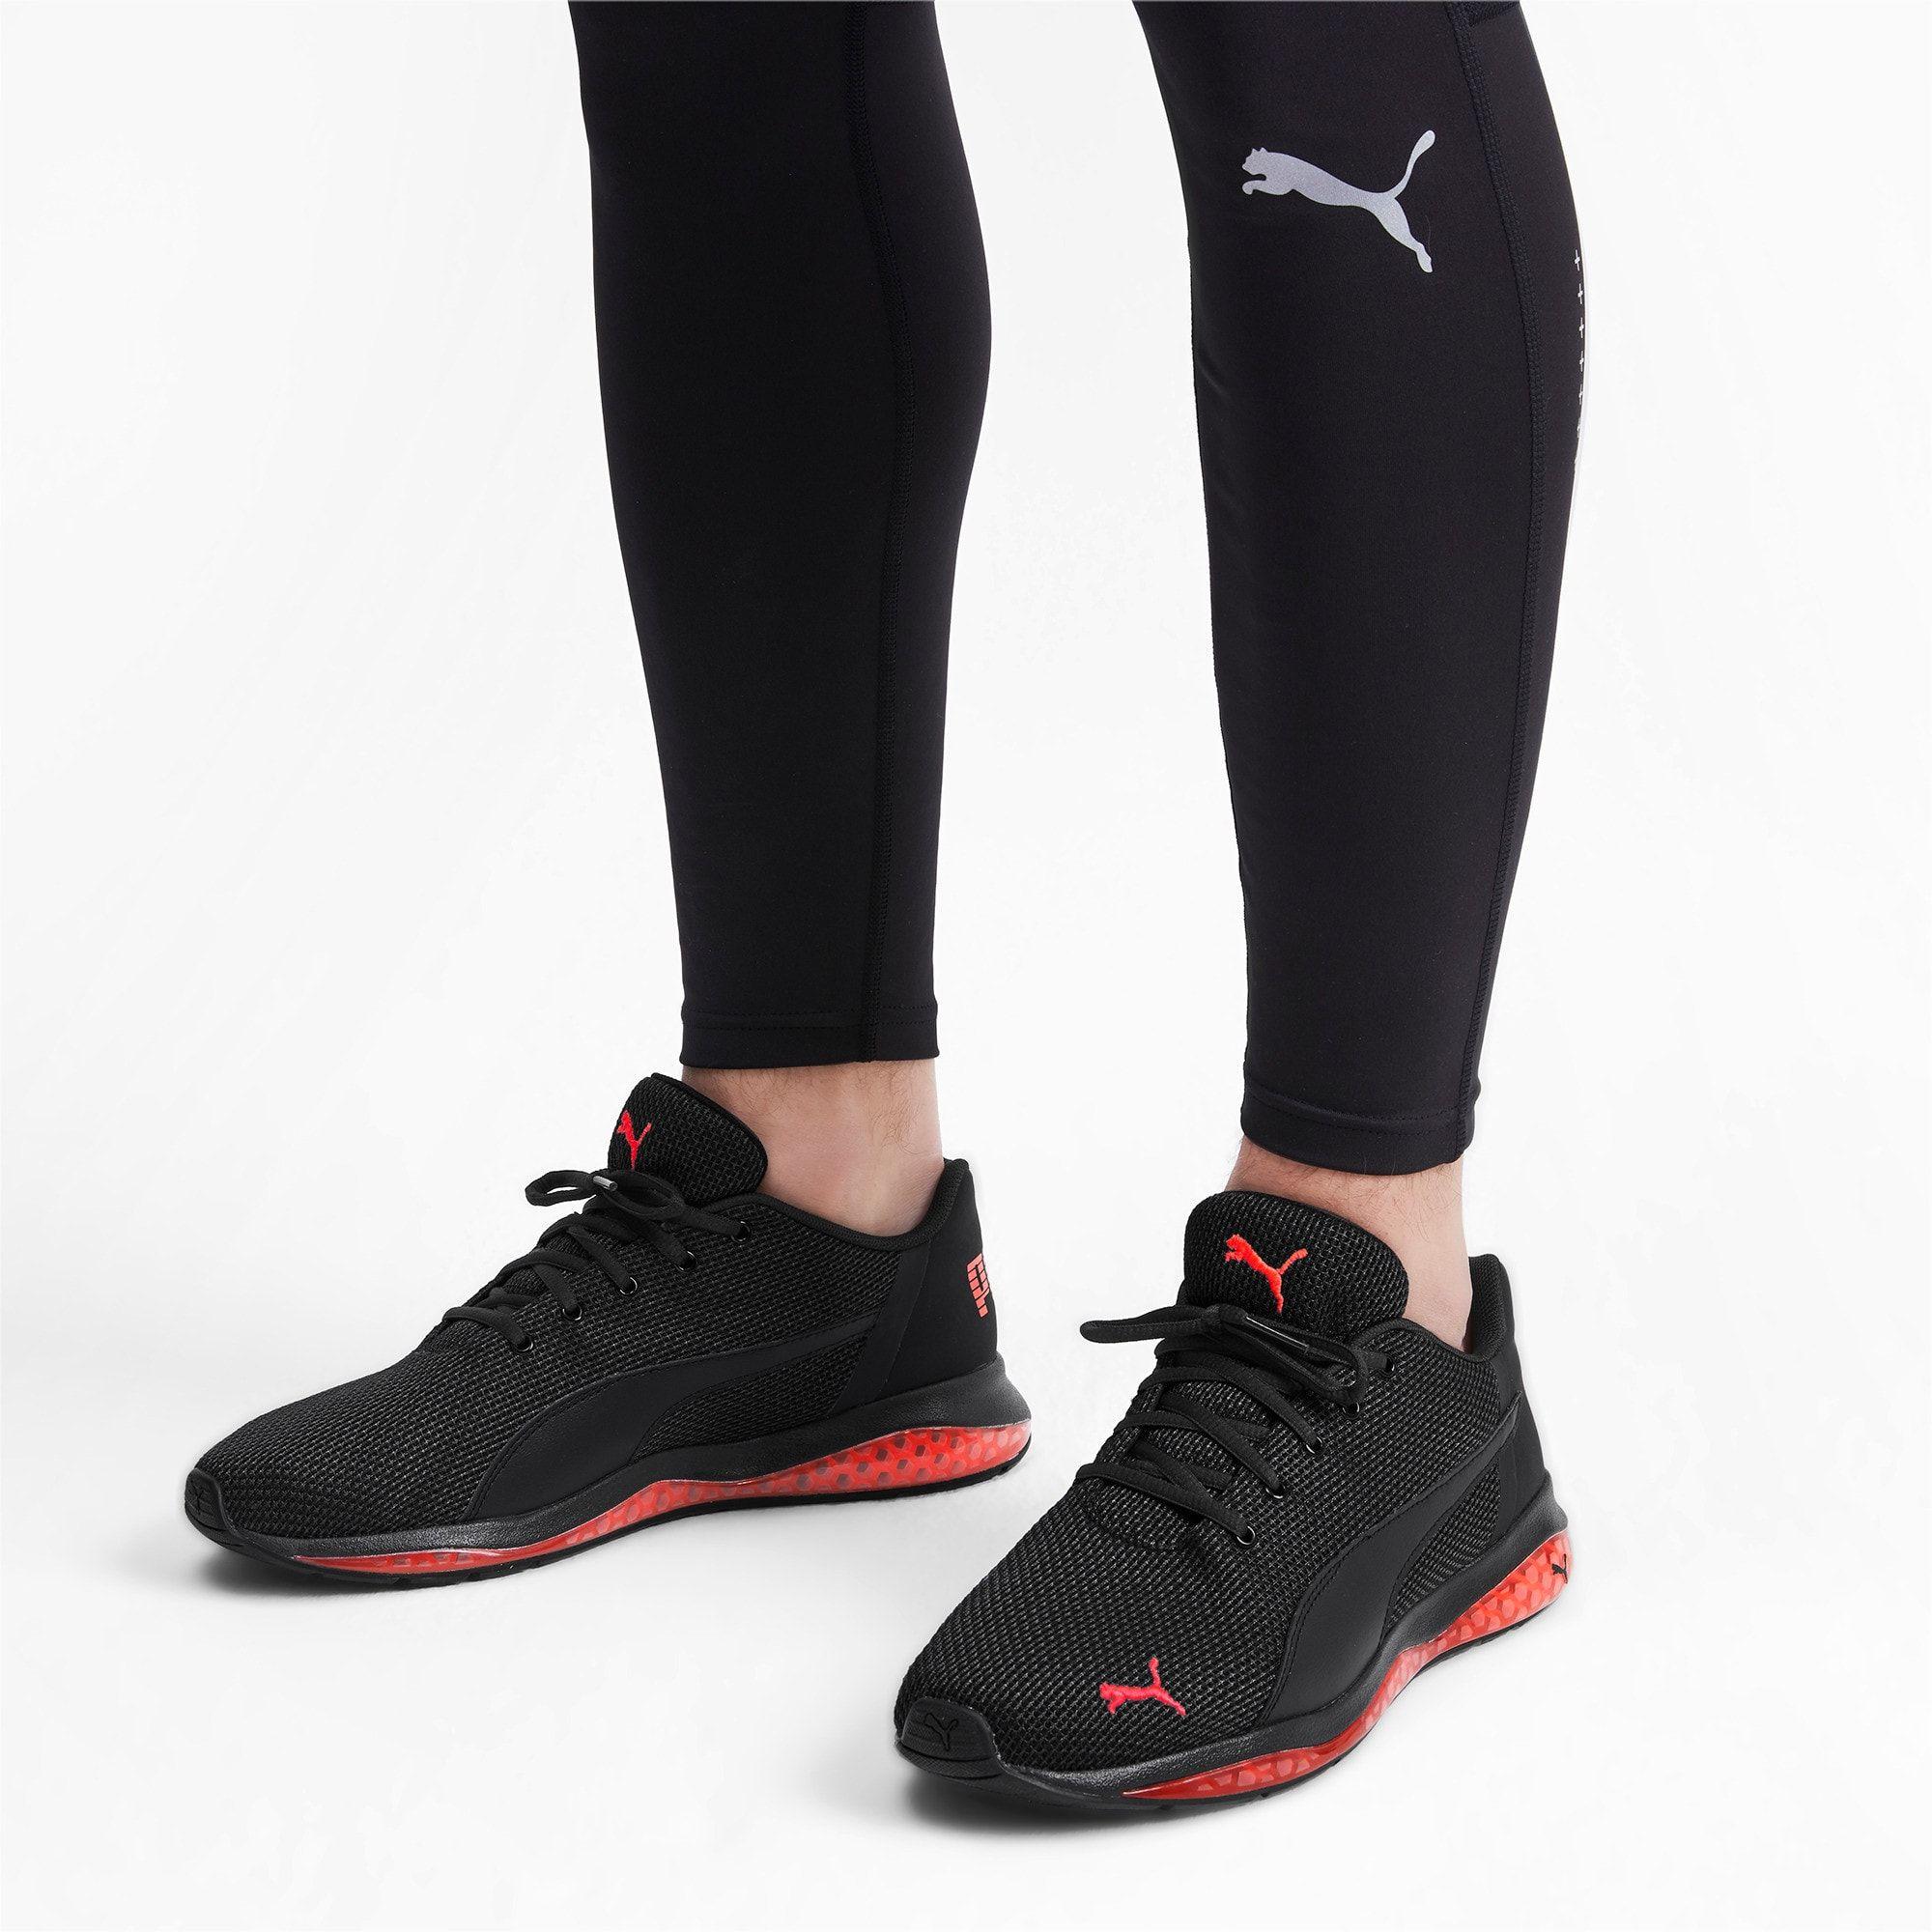 puma chaussure homme running